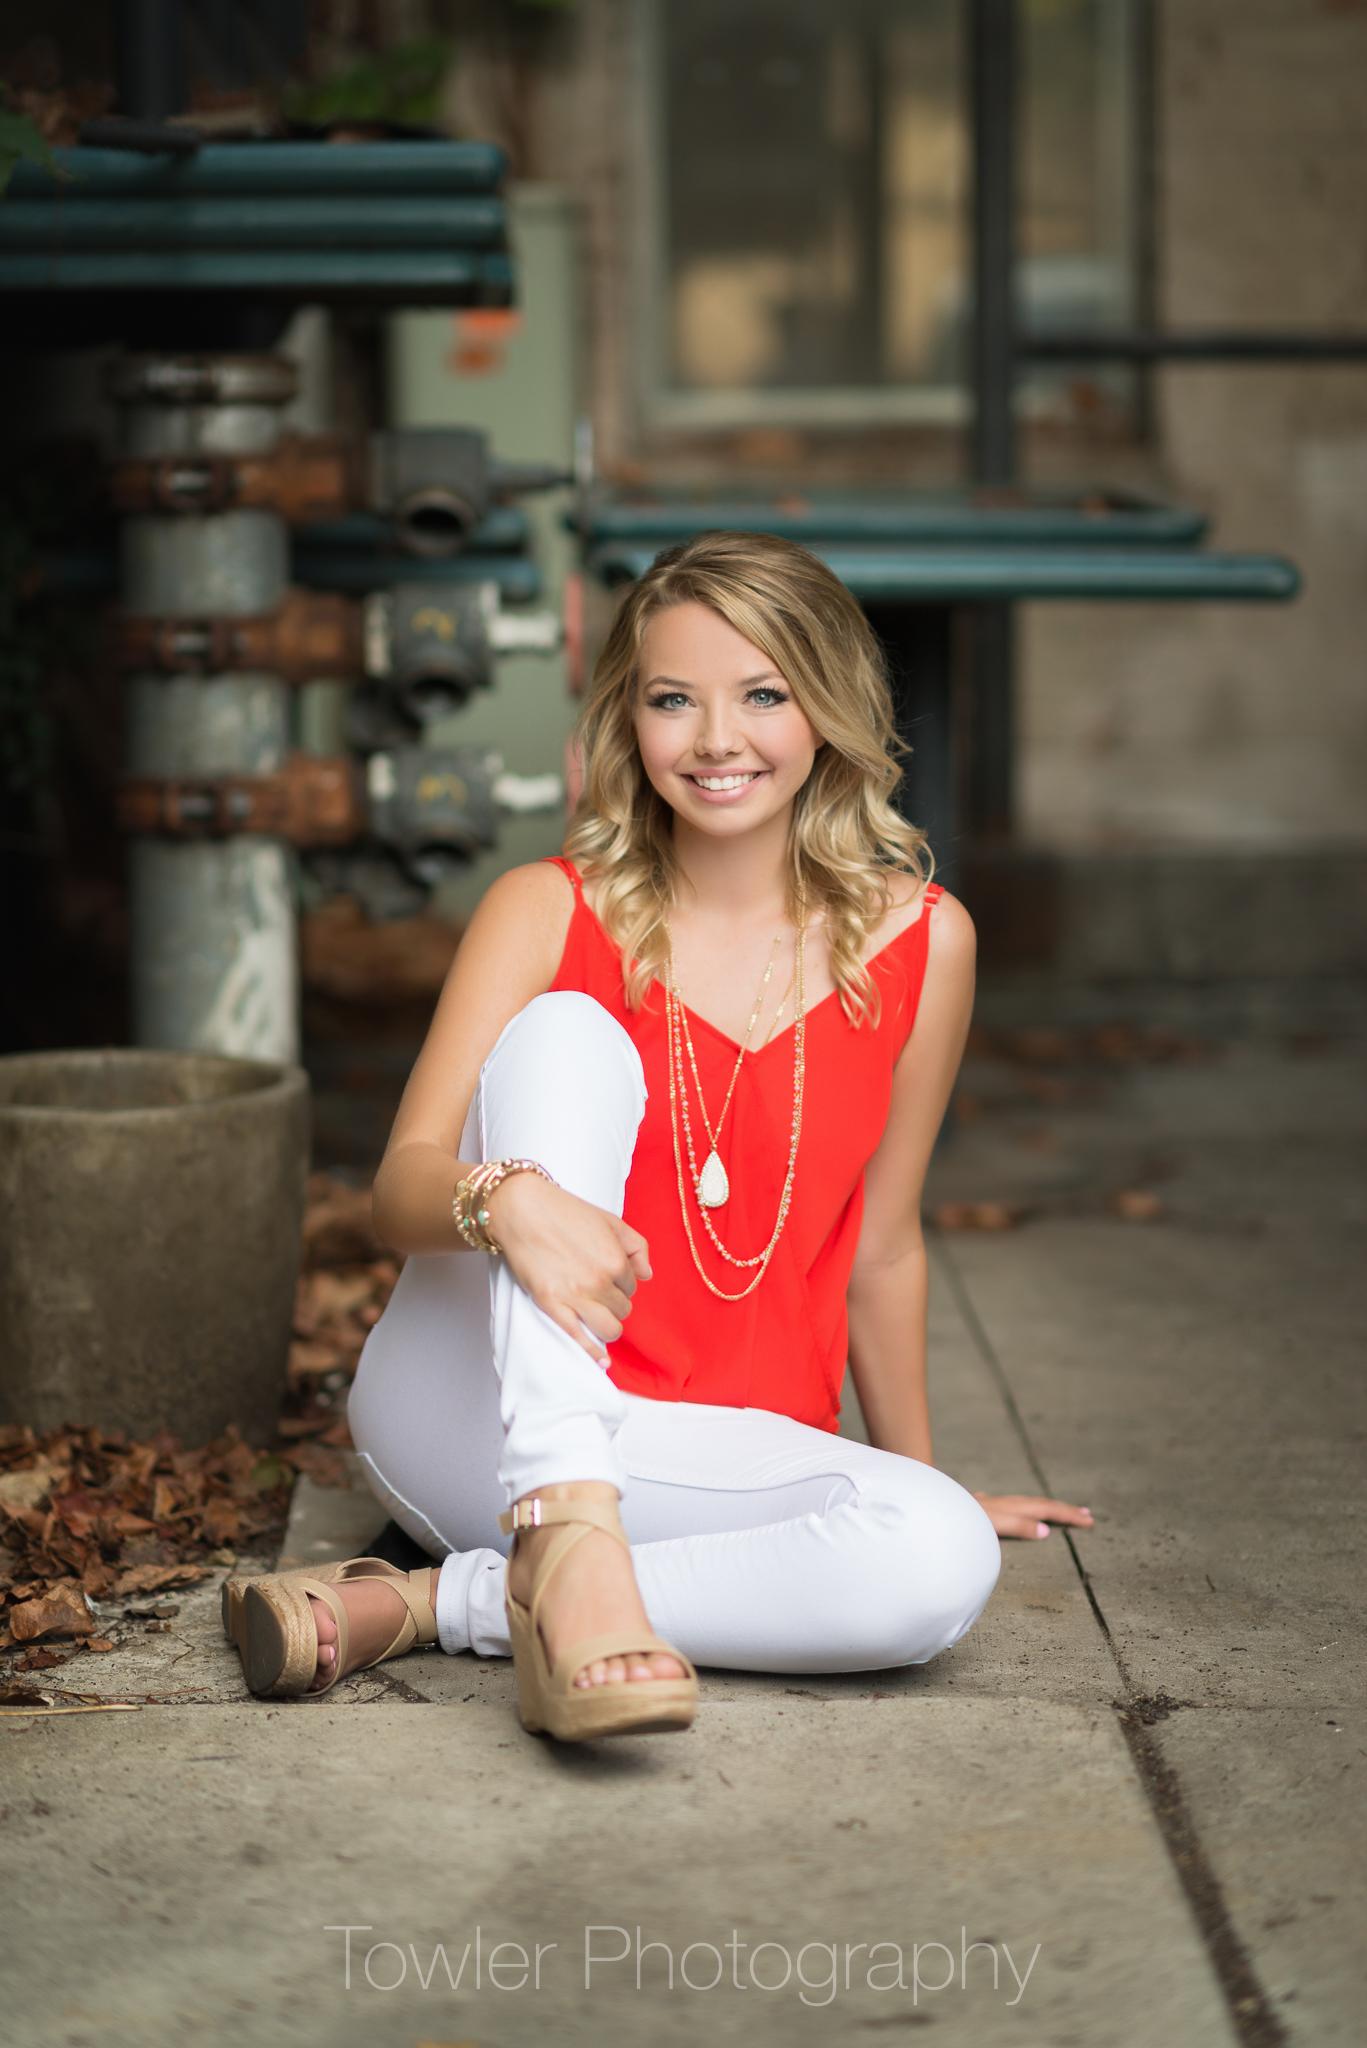 IvySEEN-Towler Photography-Senior-KL-Iowa City-89